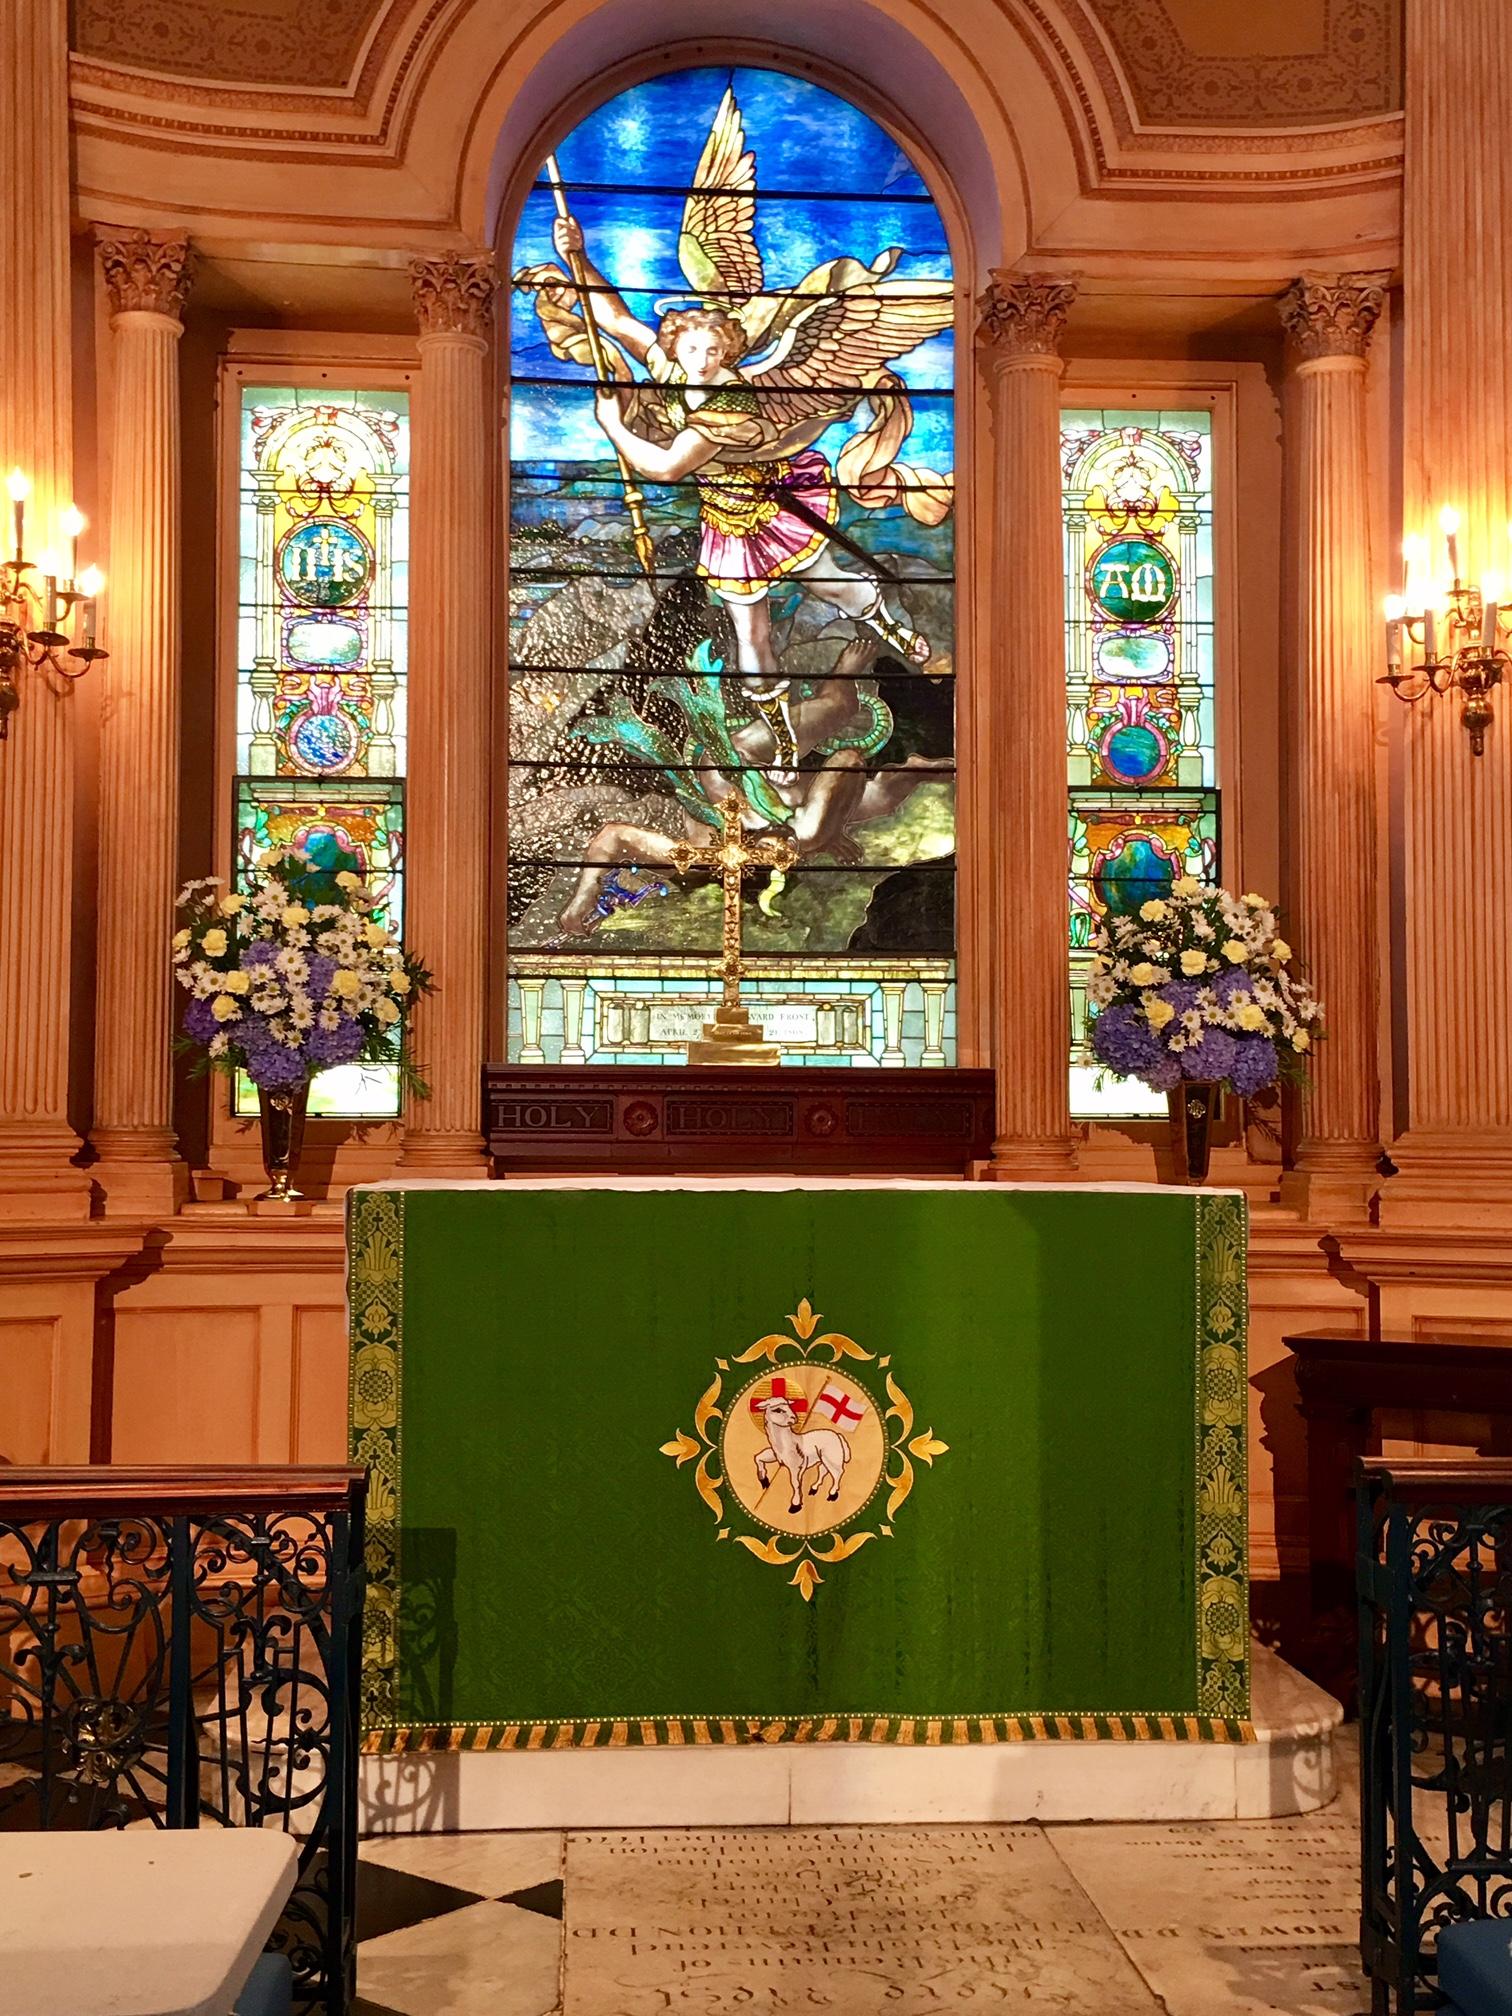 St. Michael's Episcopal Church (1)